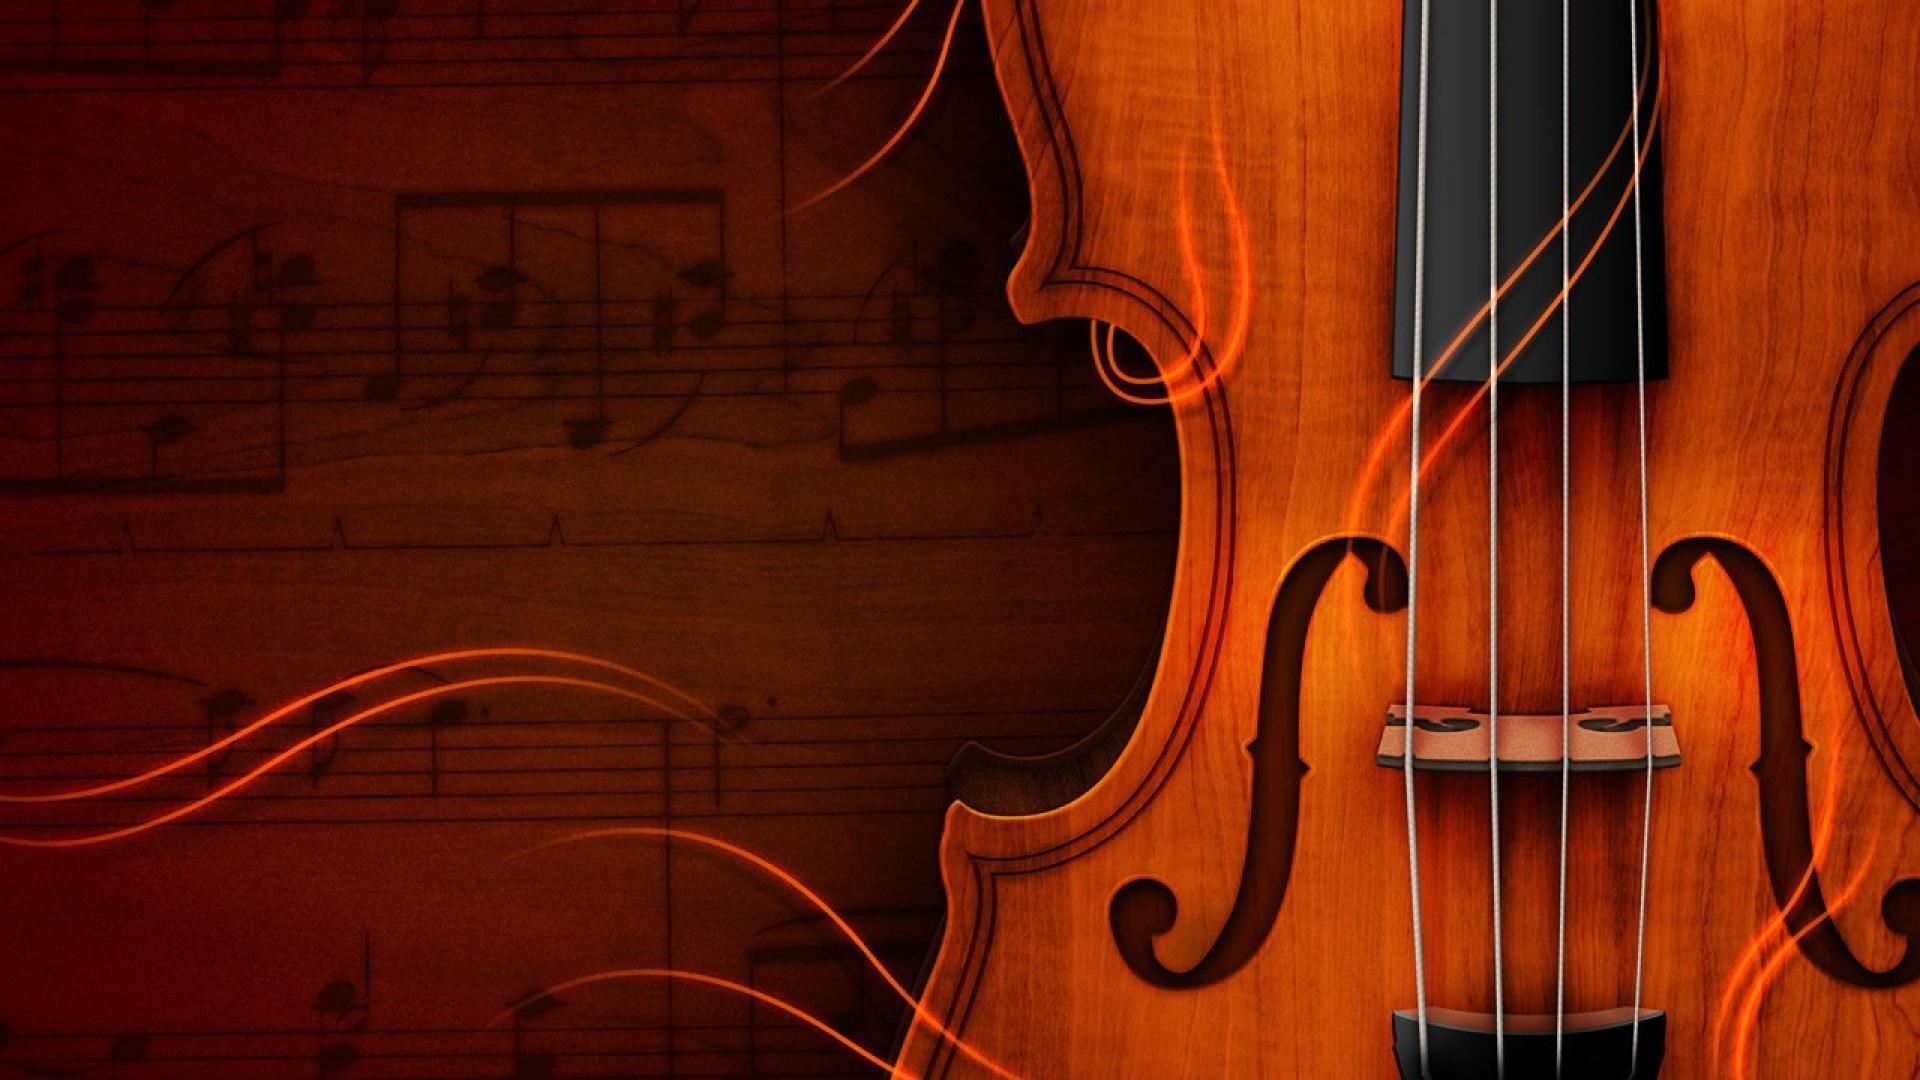 57 Classical Music Wallpapers For Desktop